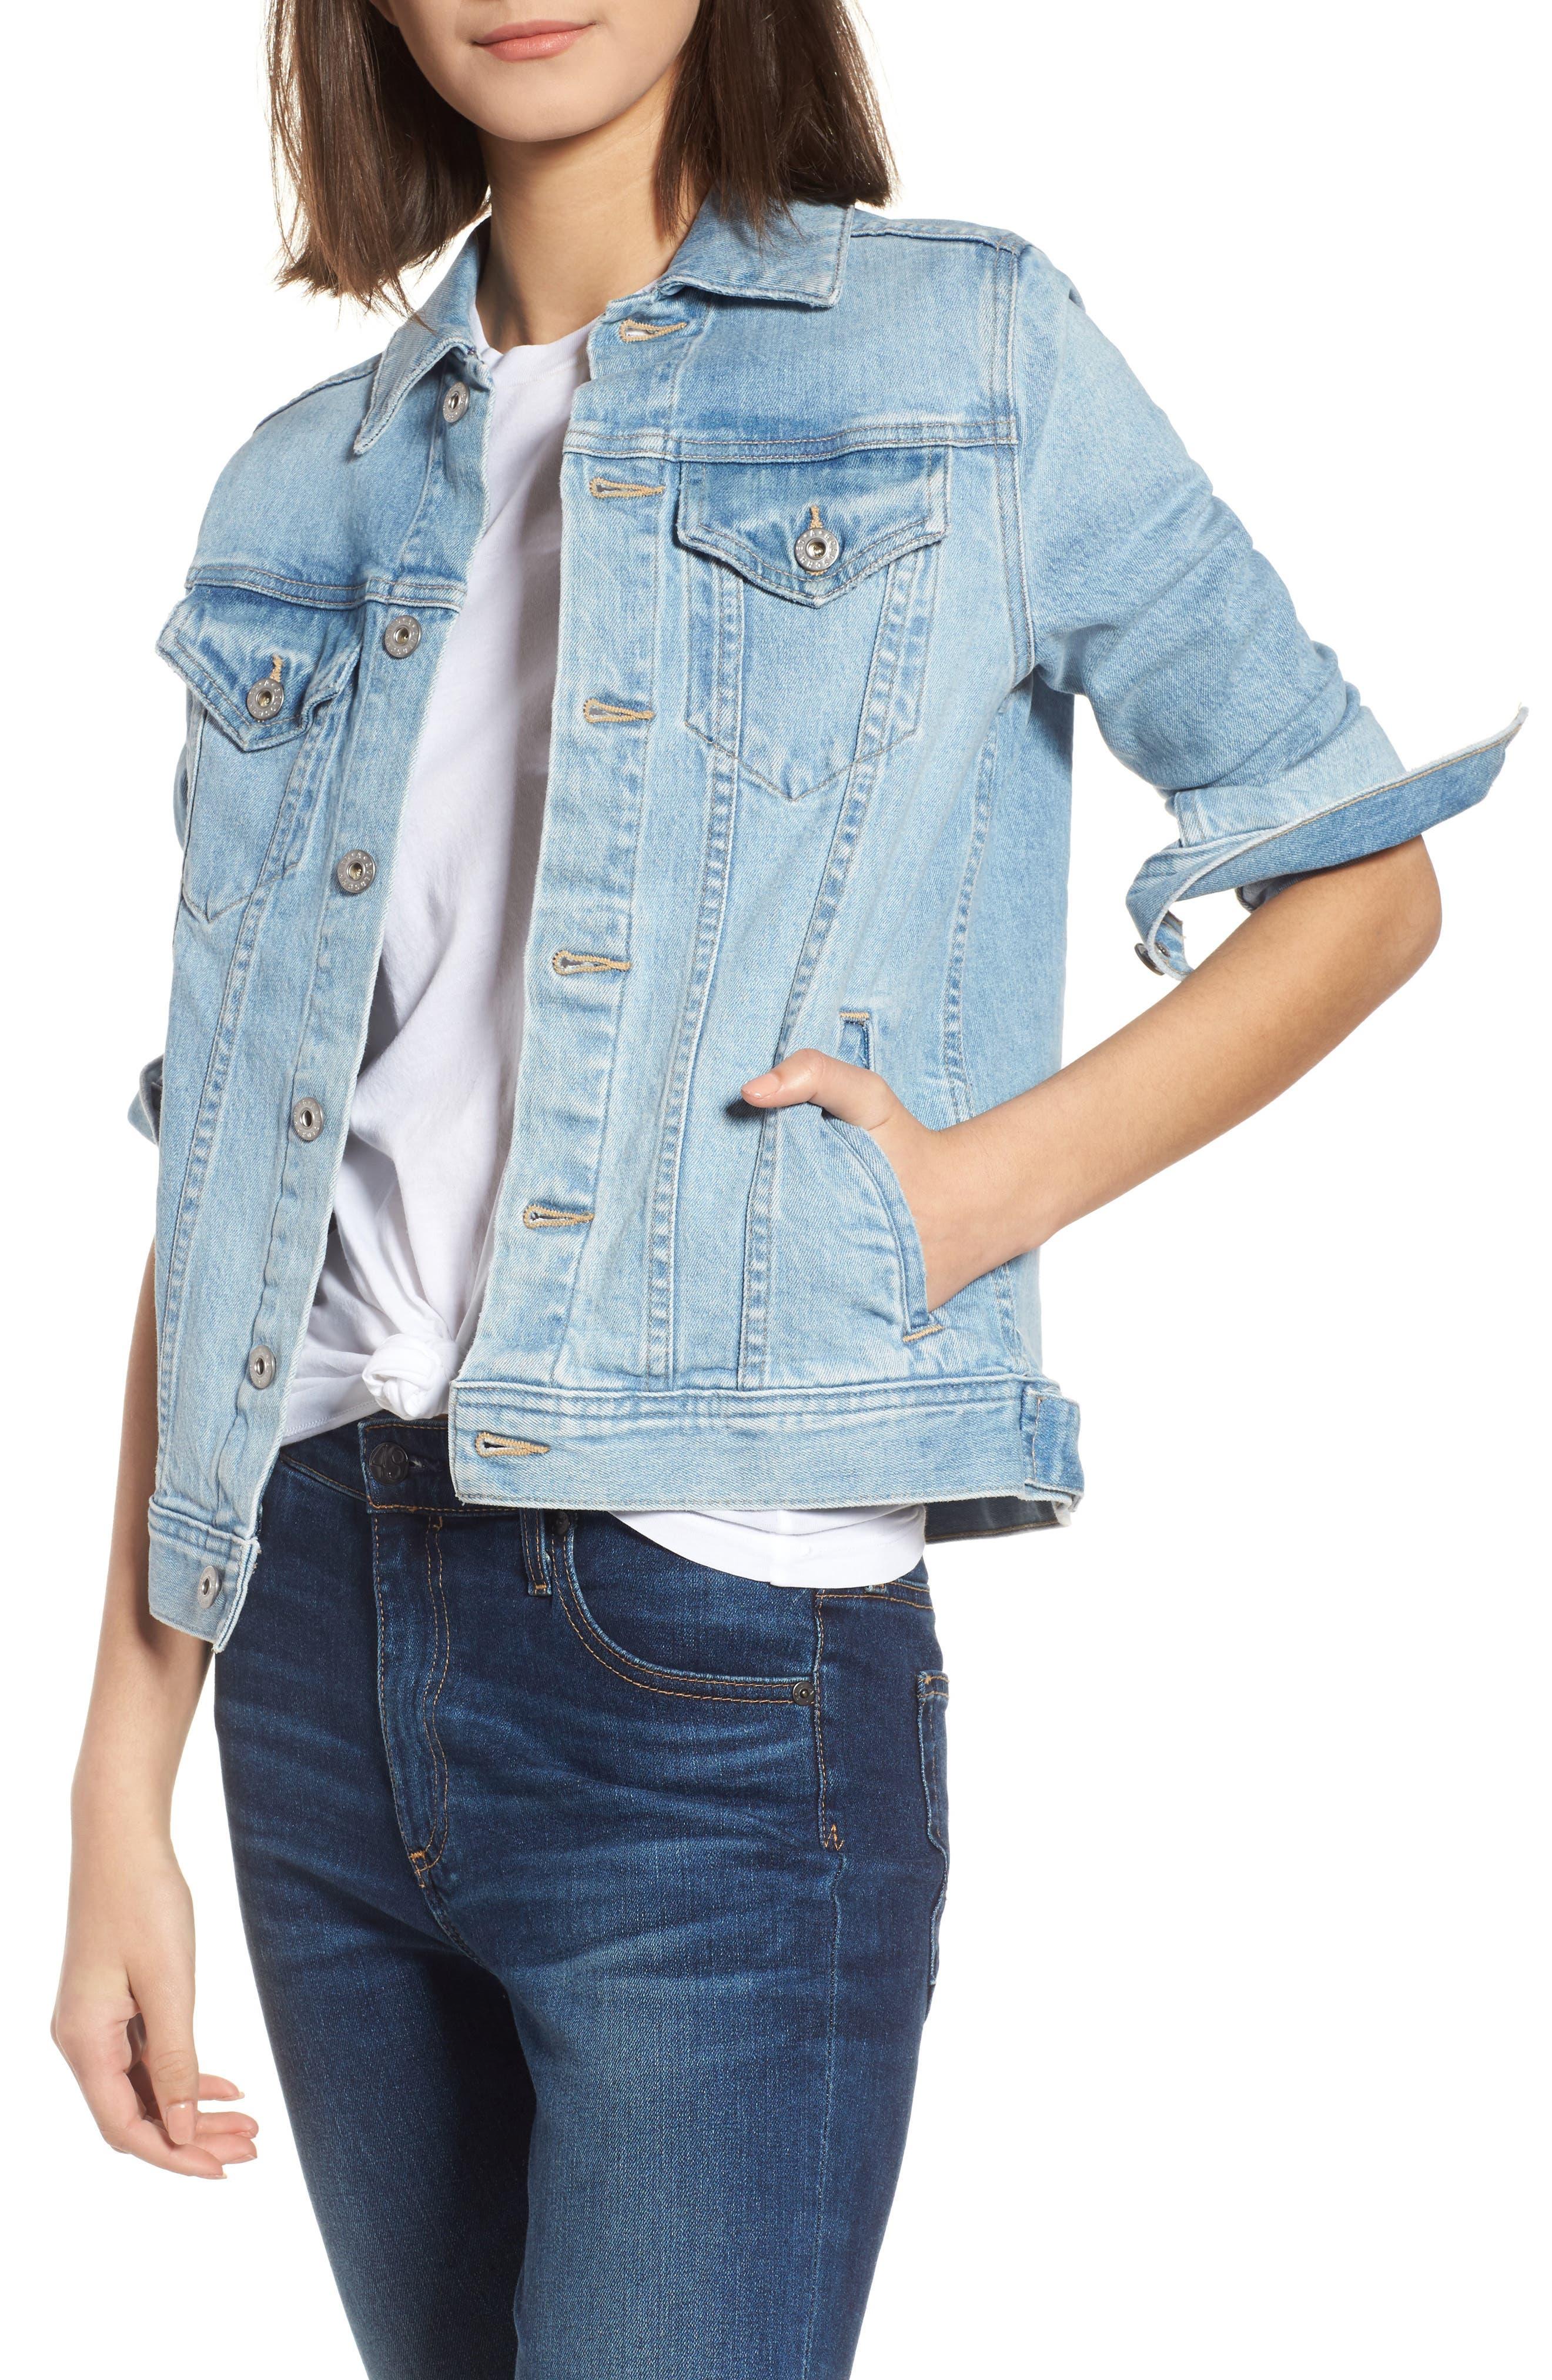 Mya Denim Jacket,                         Main,                         color, SUNLIGHT BLUE